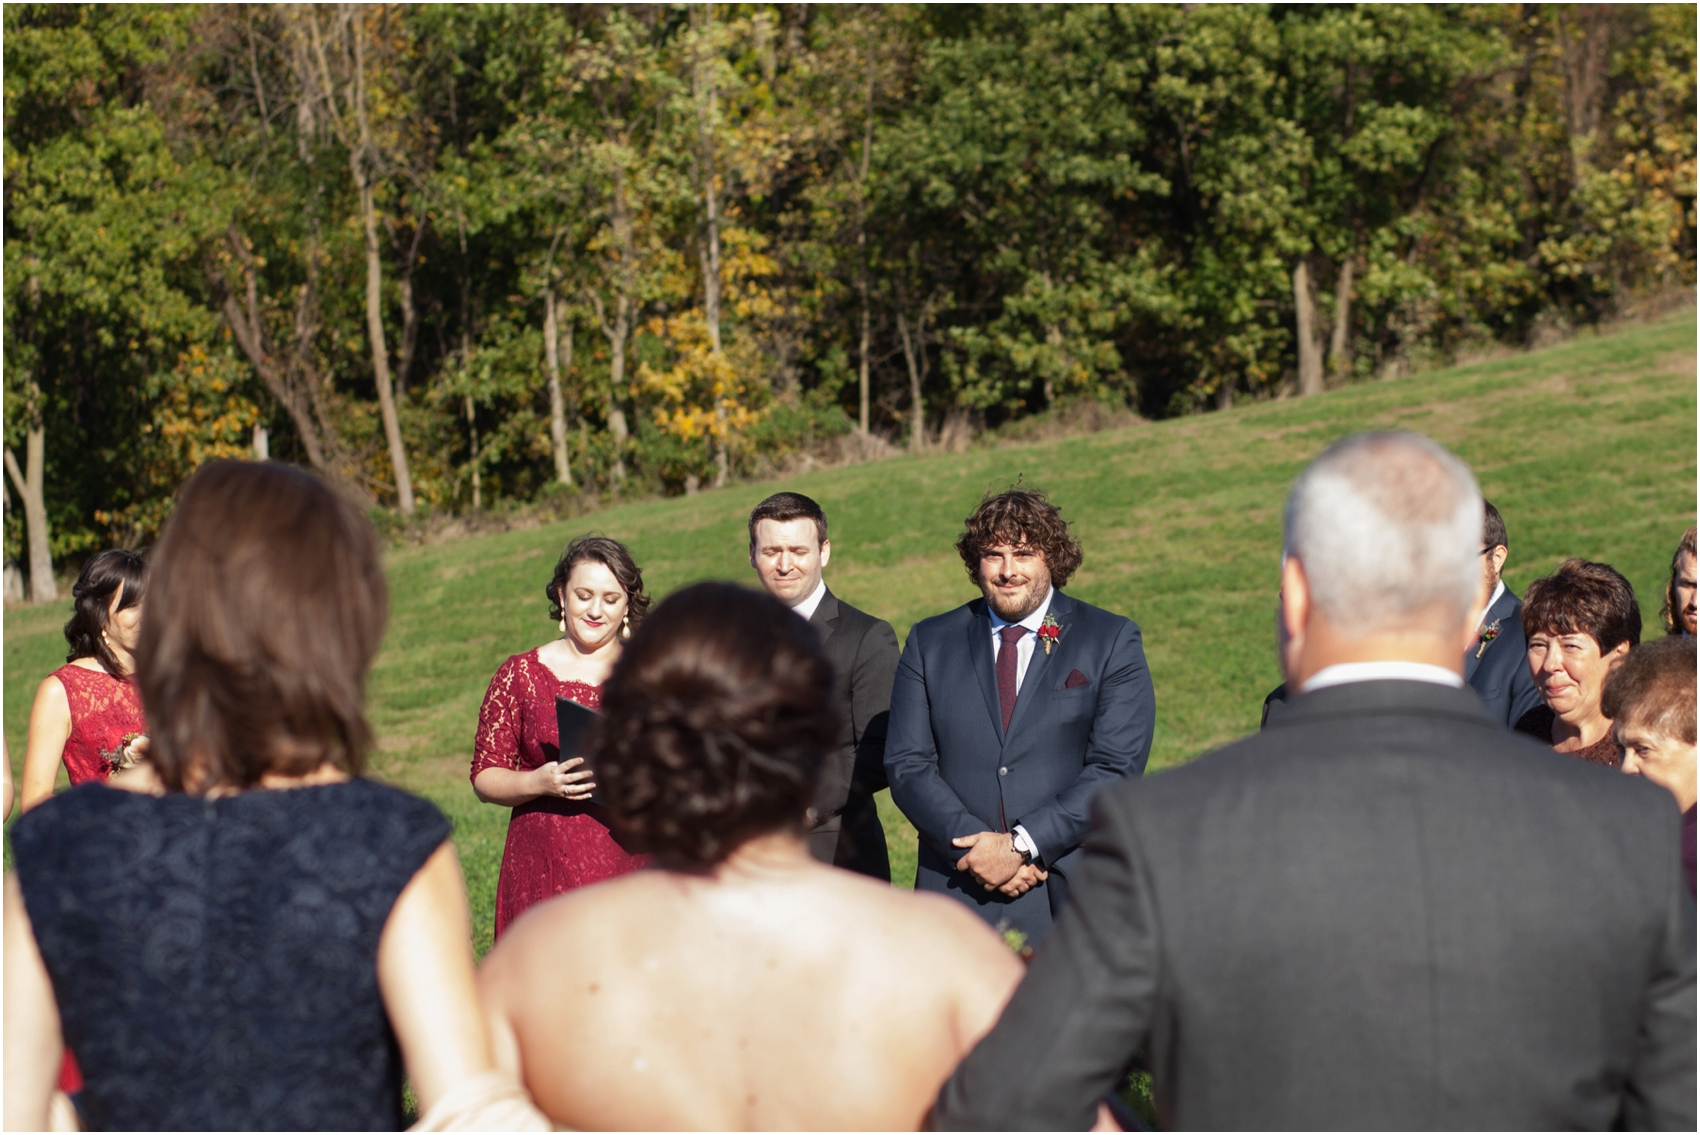 On-Sunny-Slope-Farm-Fall-Virginia-Wedding-2809.jpg